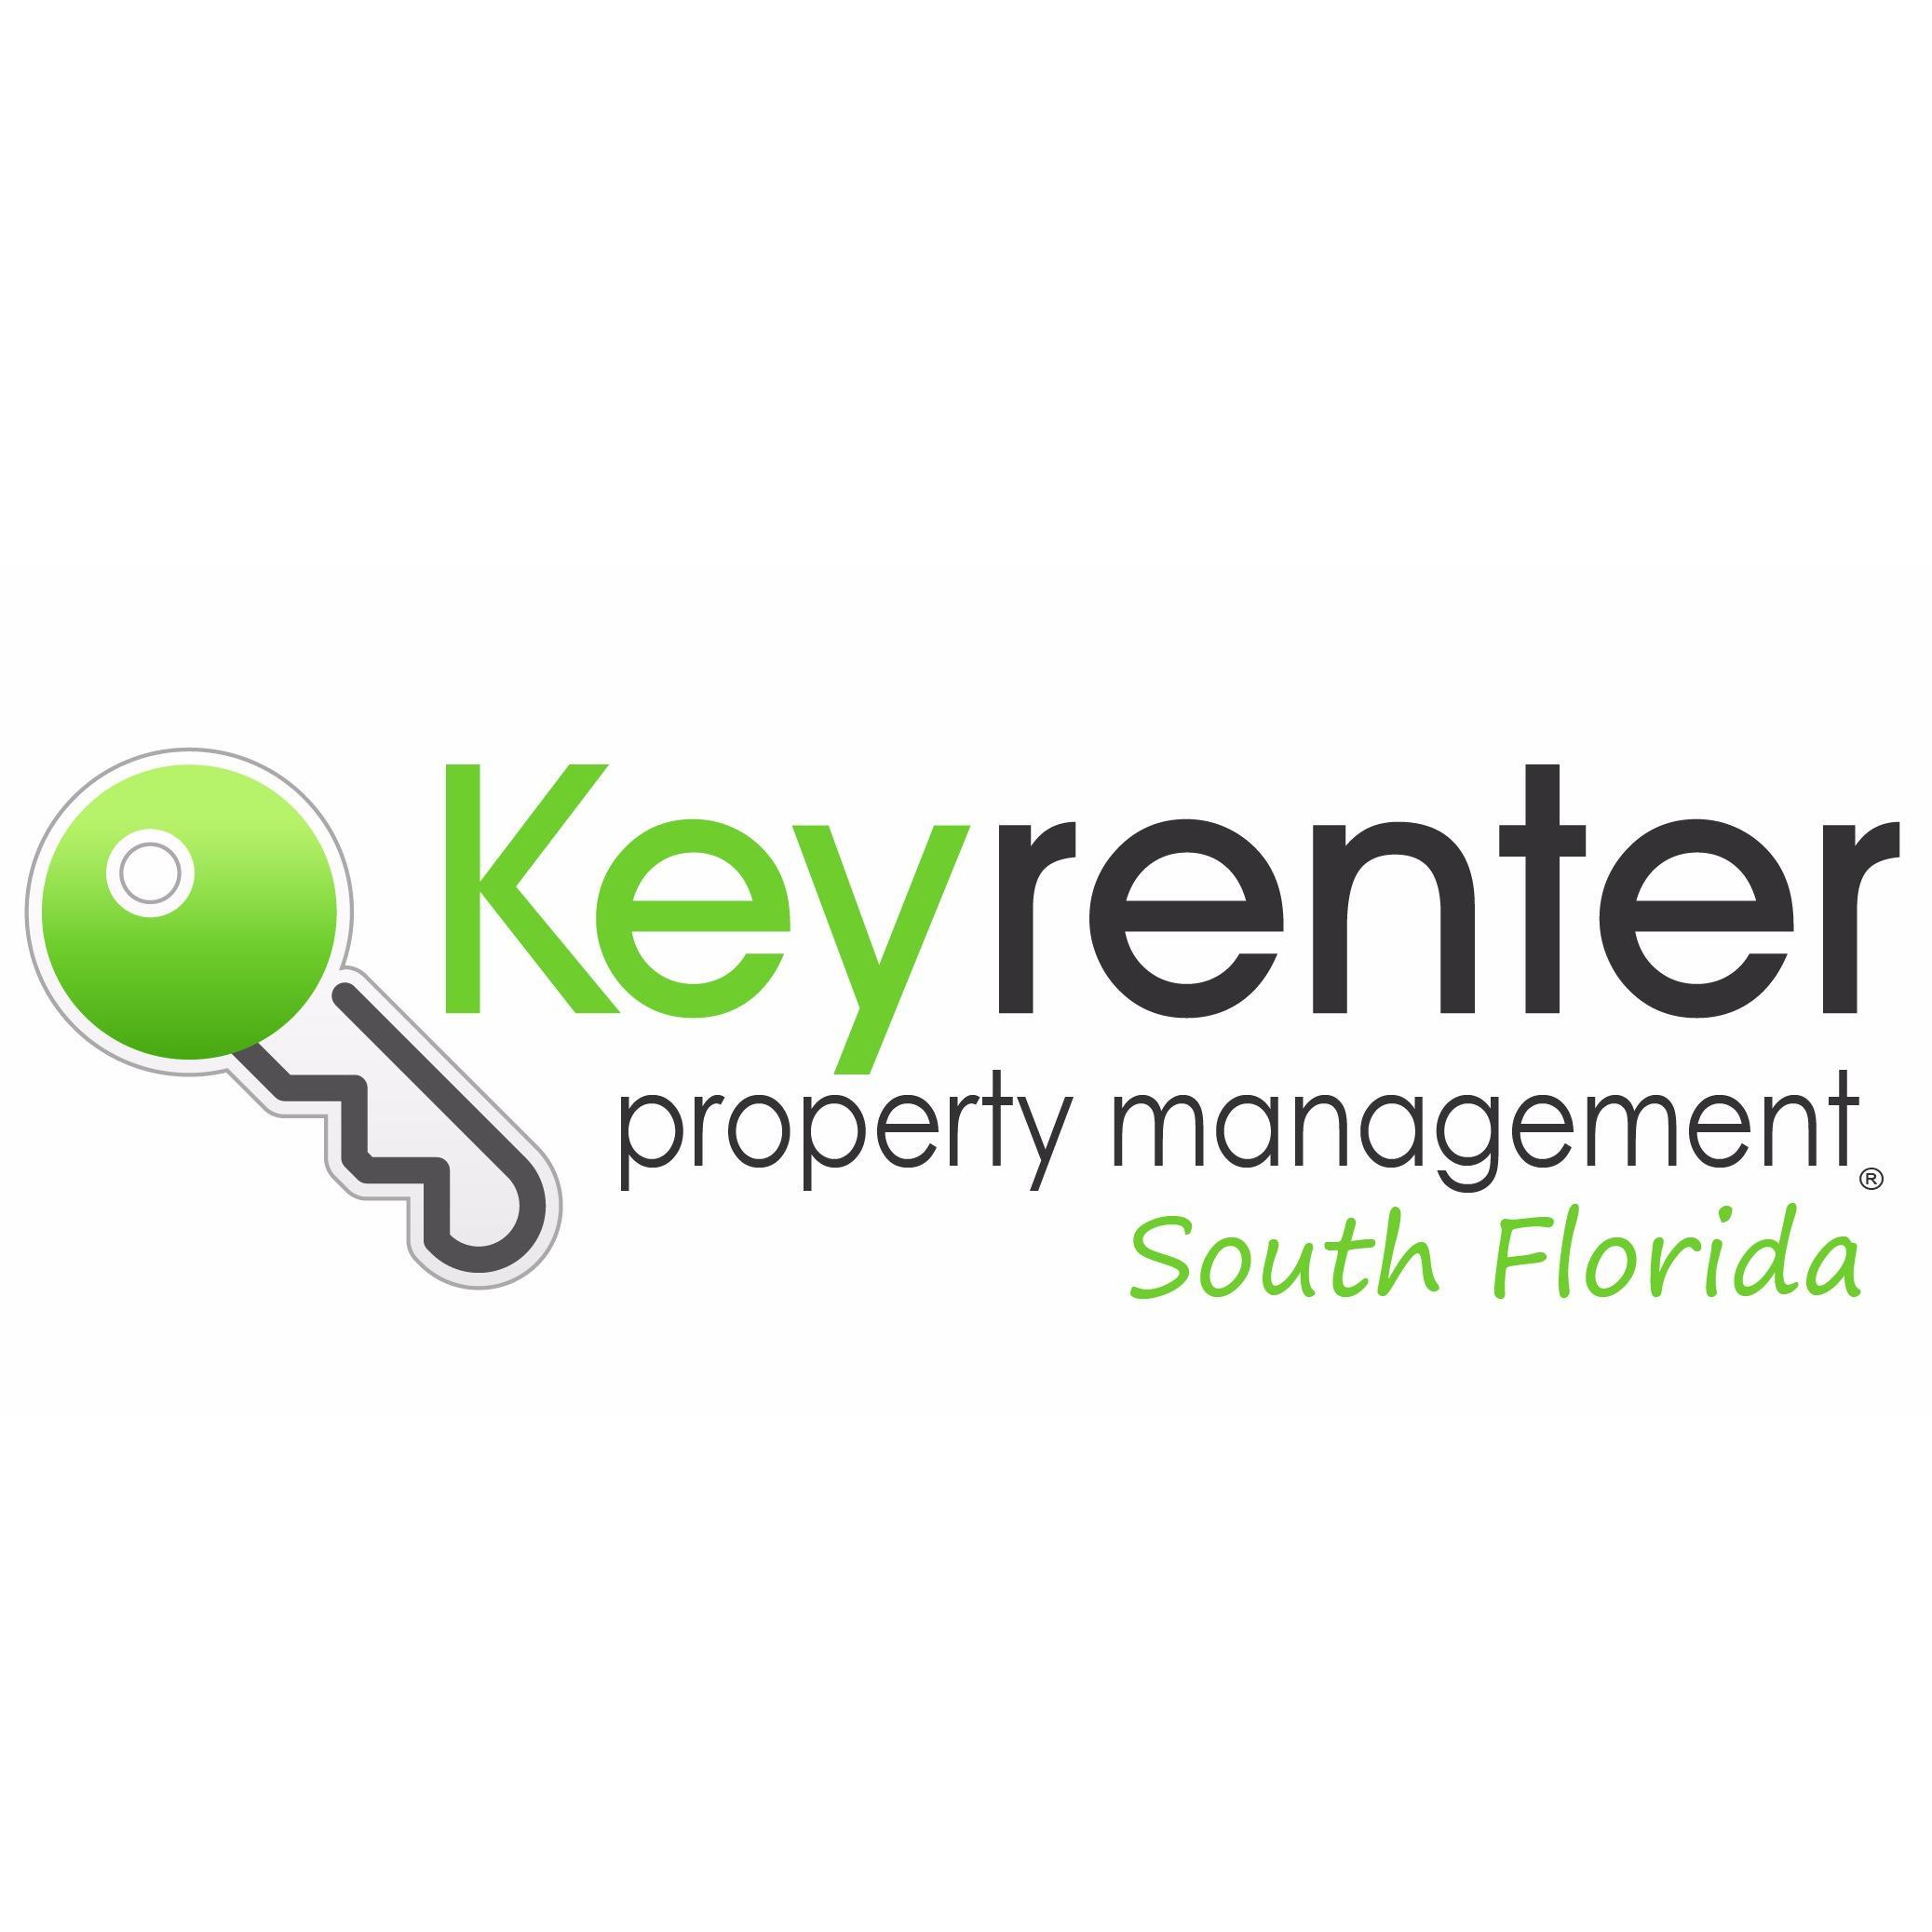 Keyrenter Property Management South Florida image 0